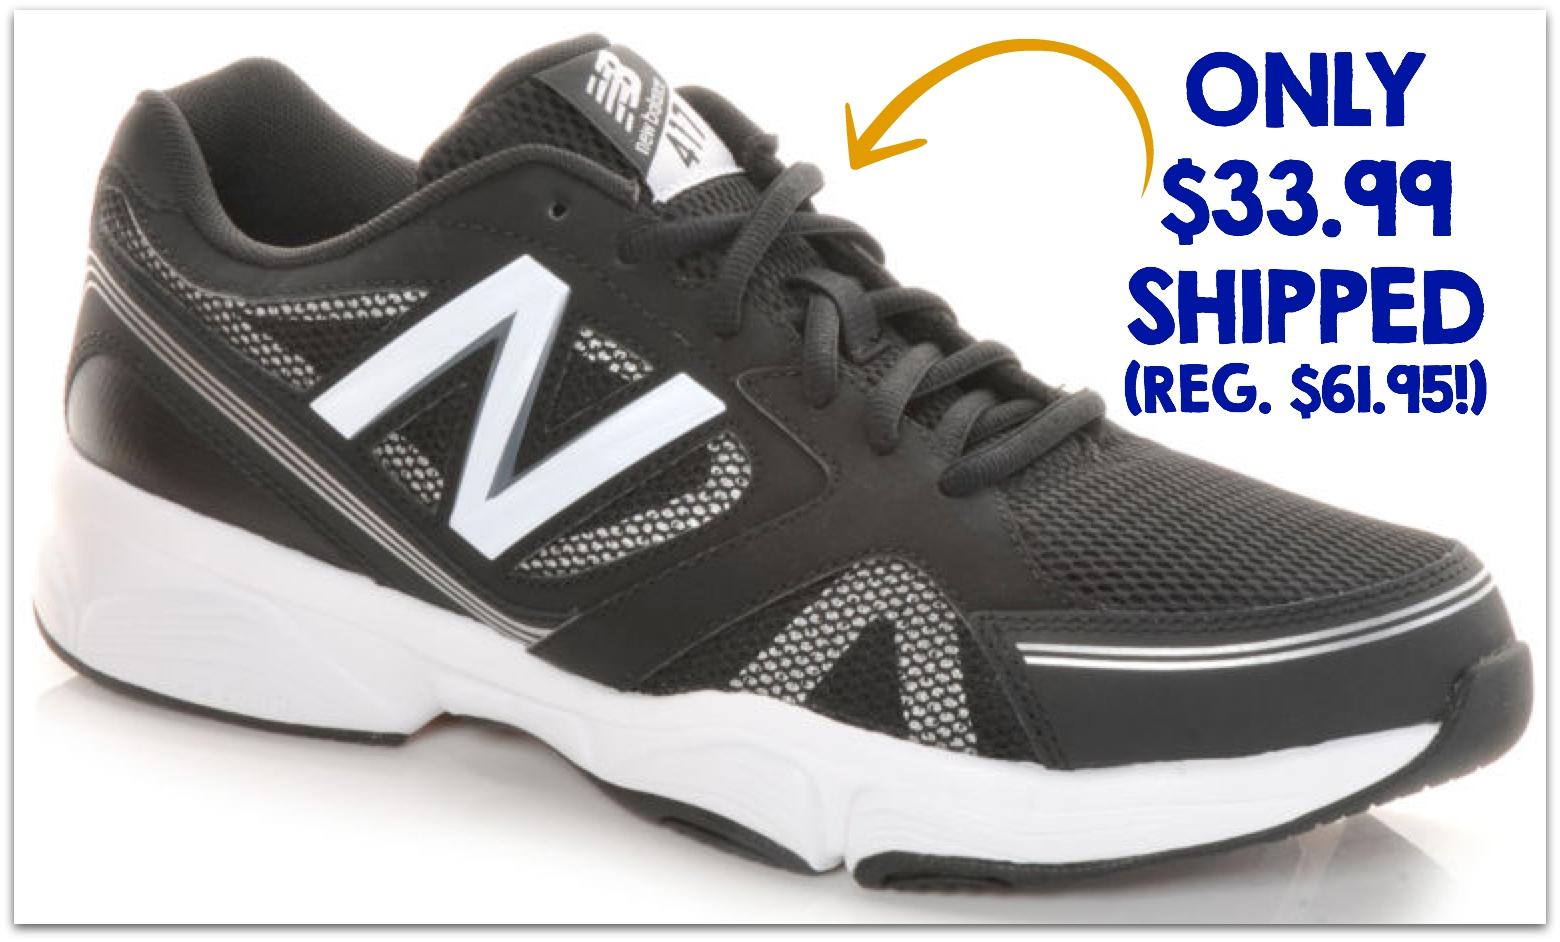 Men's New Balance Cross-Training Shoes